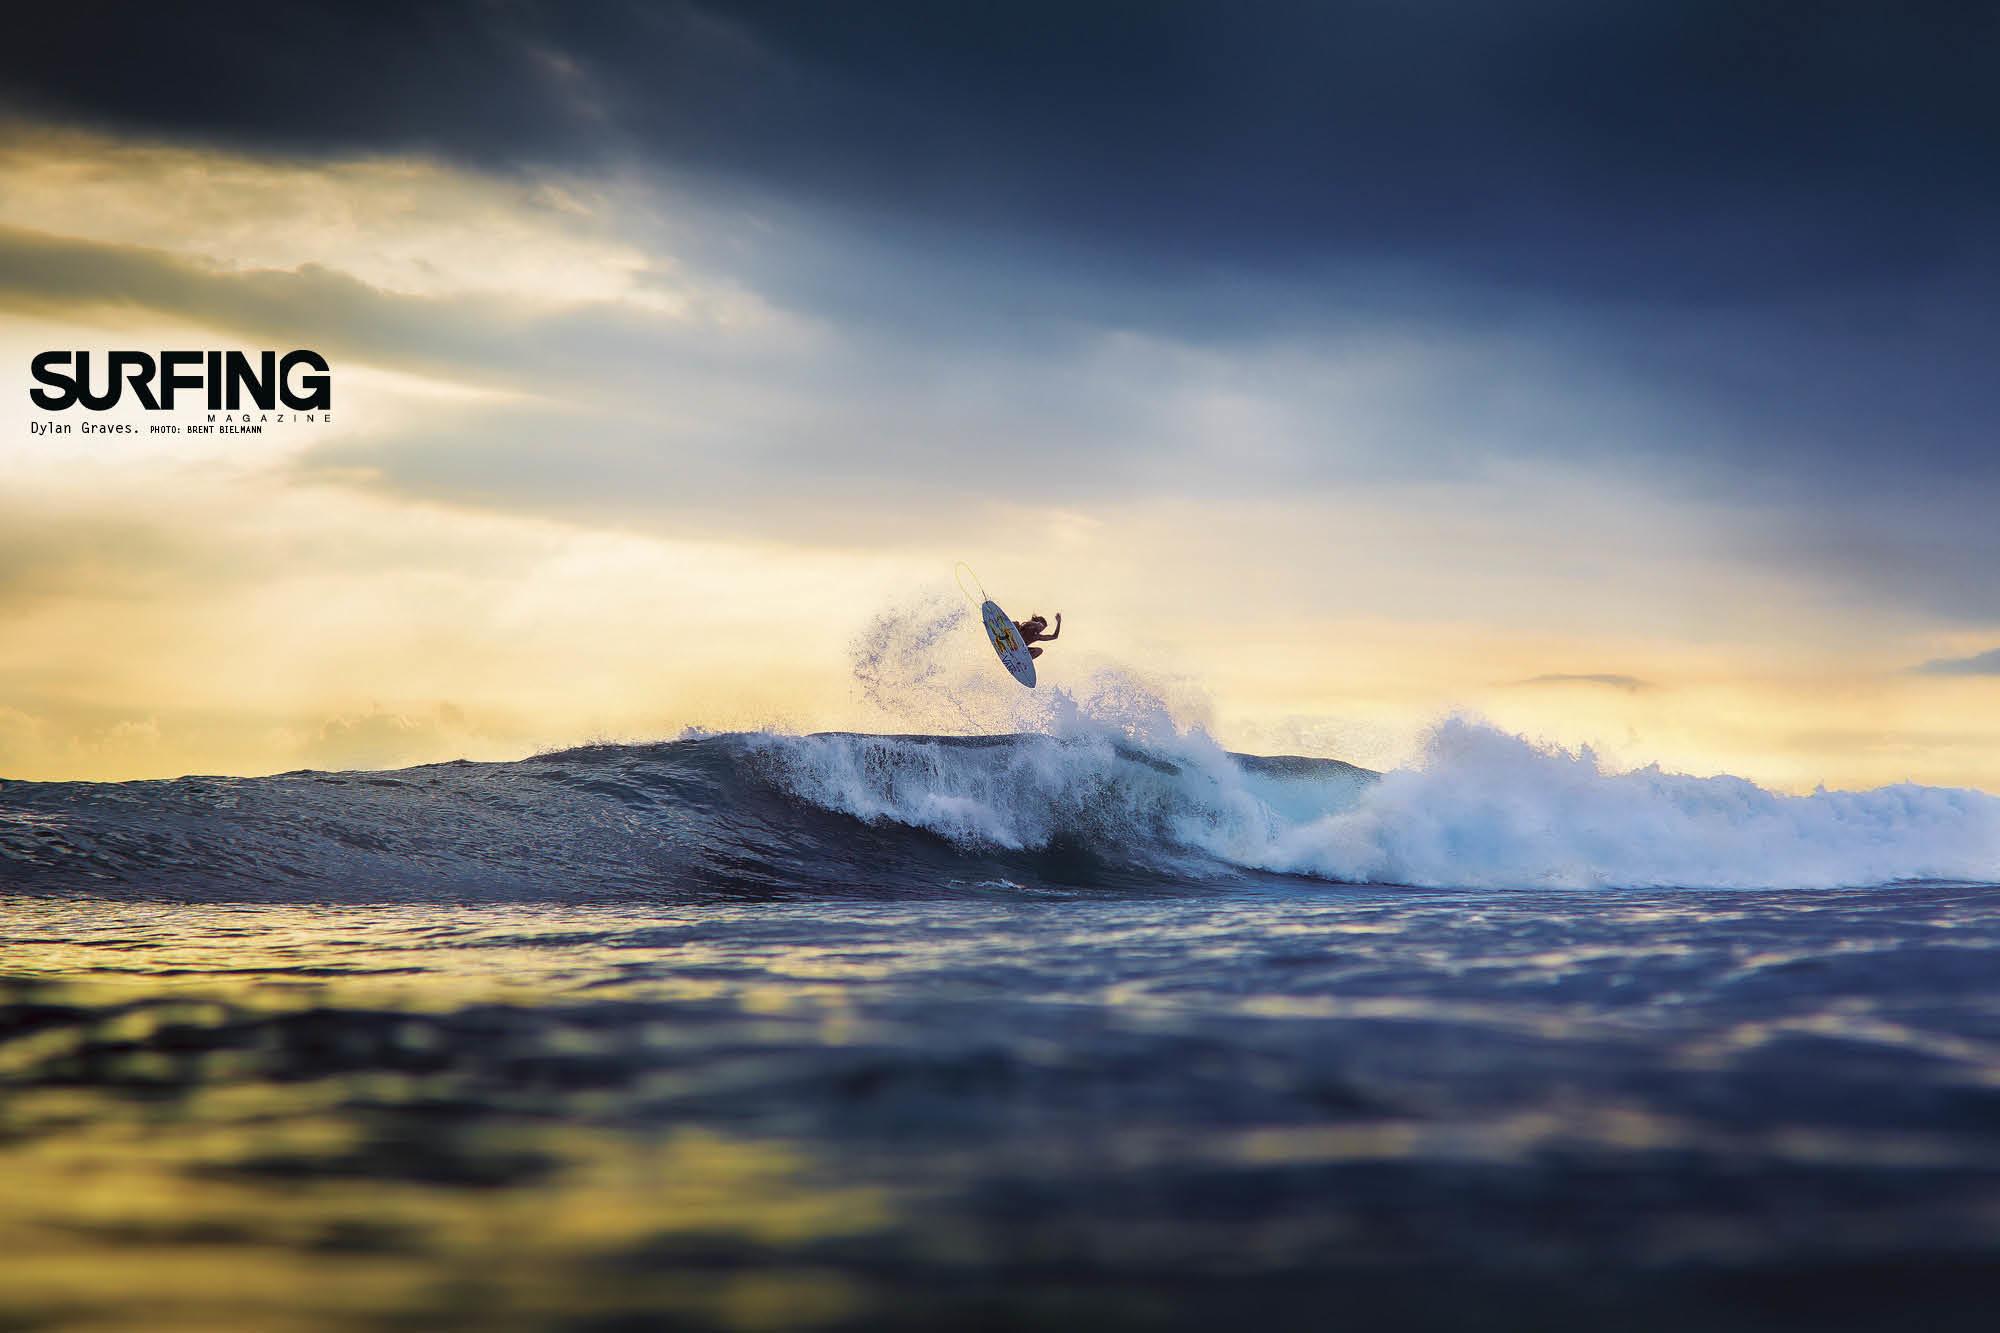 Surfing Wallpaper HD